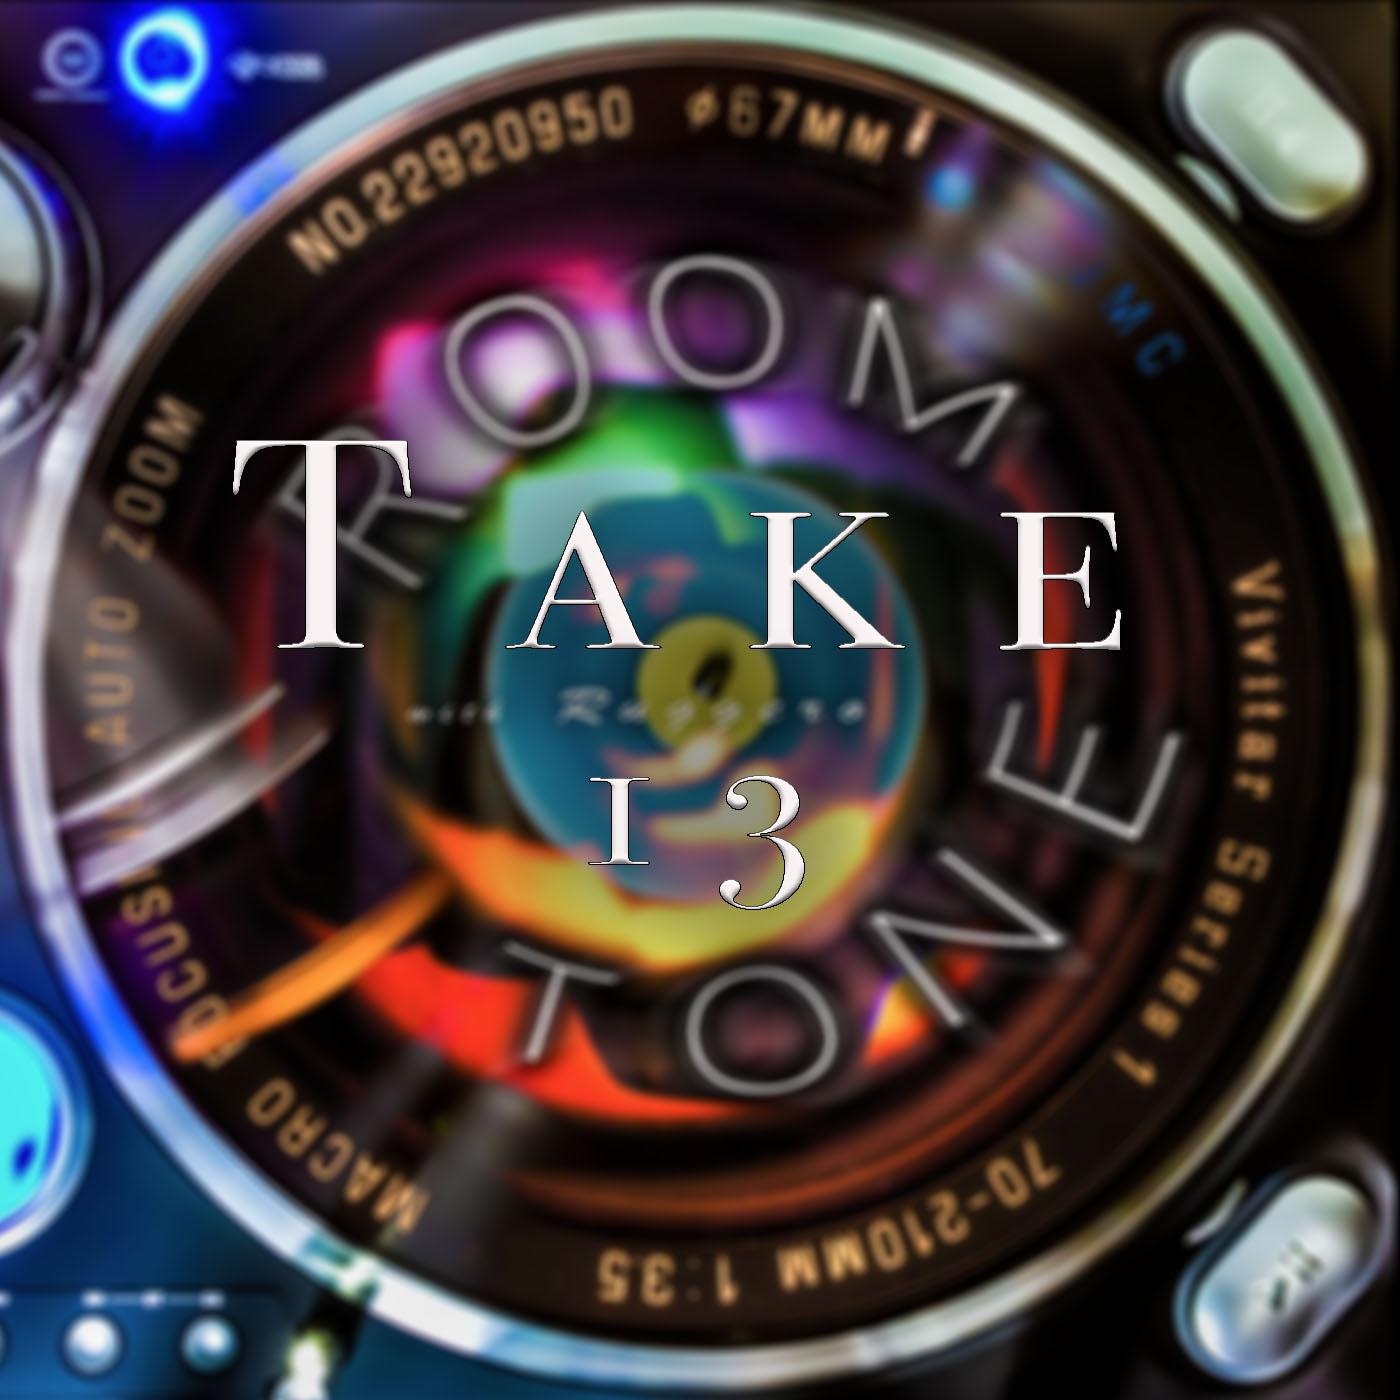 Room Tone Thumbnail Take 13.jpg